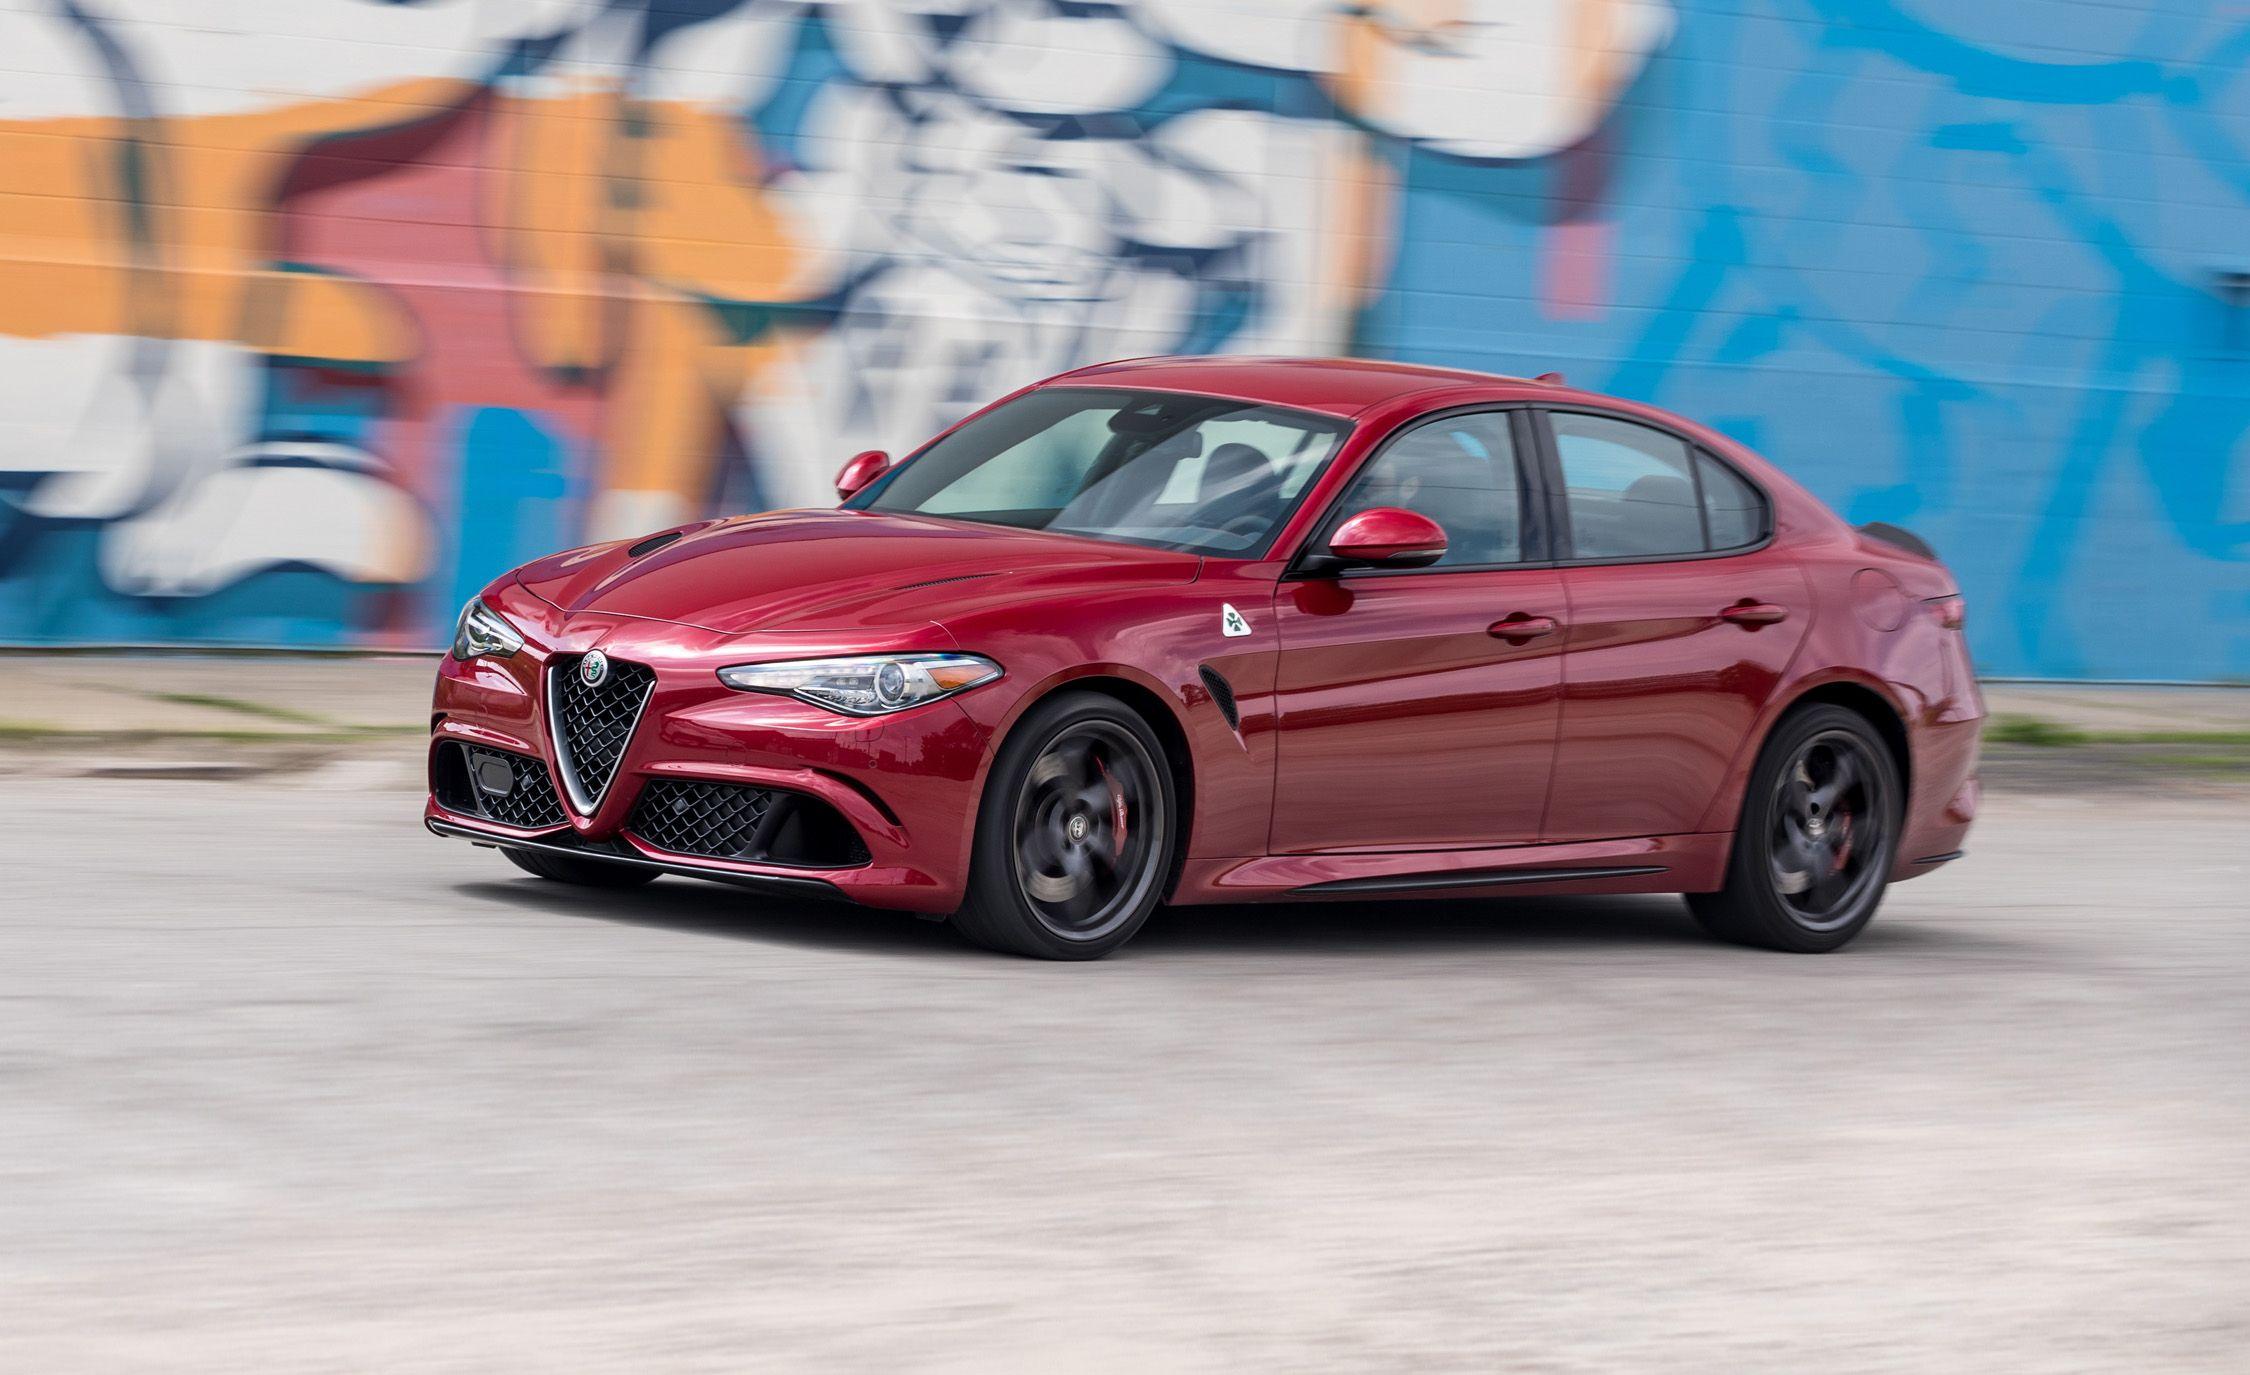 2017 Alfa Romeo Giulia Quadrifoglio First Drive Review Car And